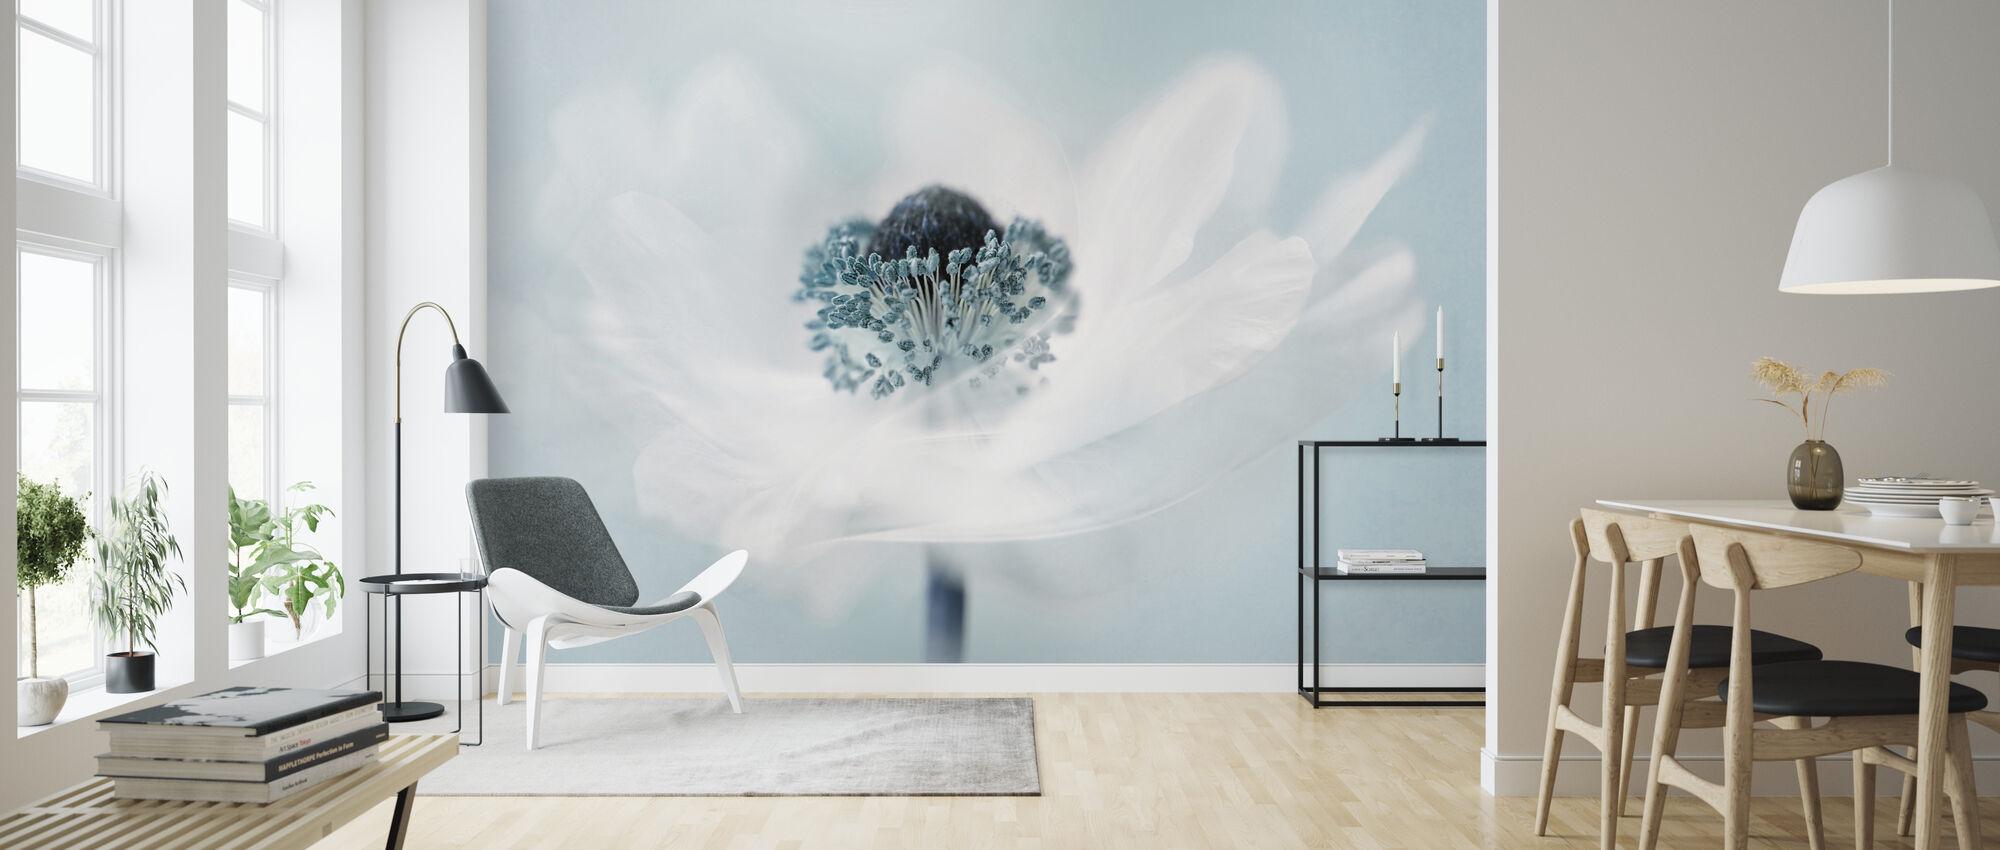 Candy Floss - Wallpaper - Living Room